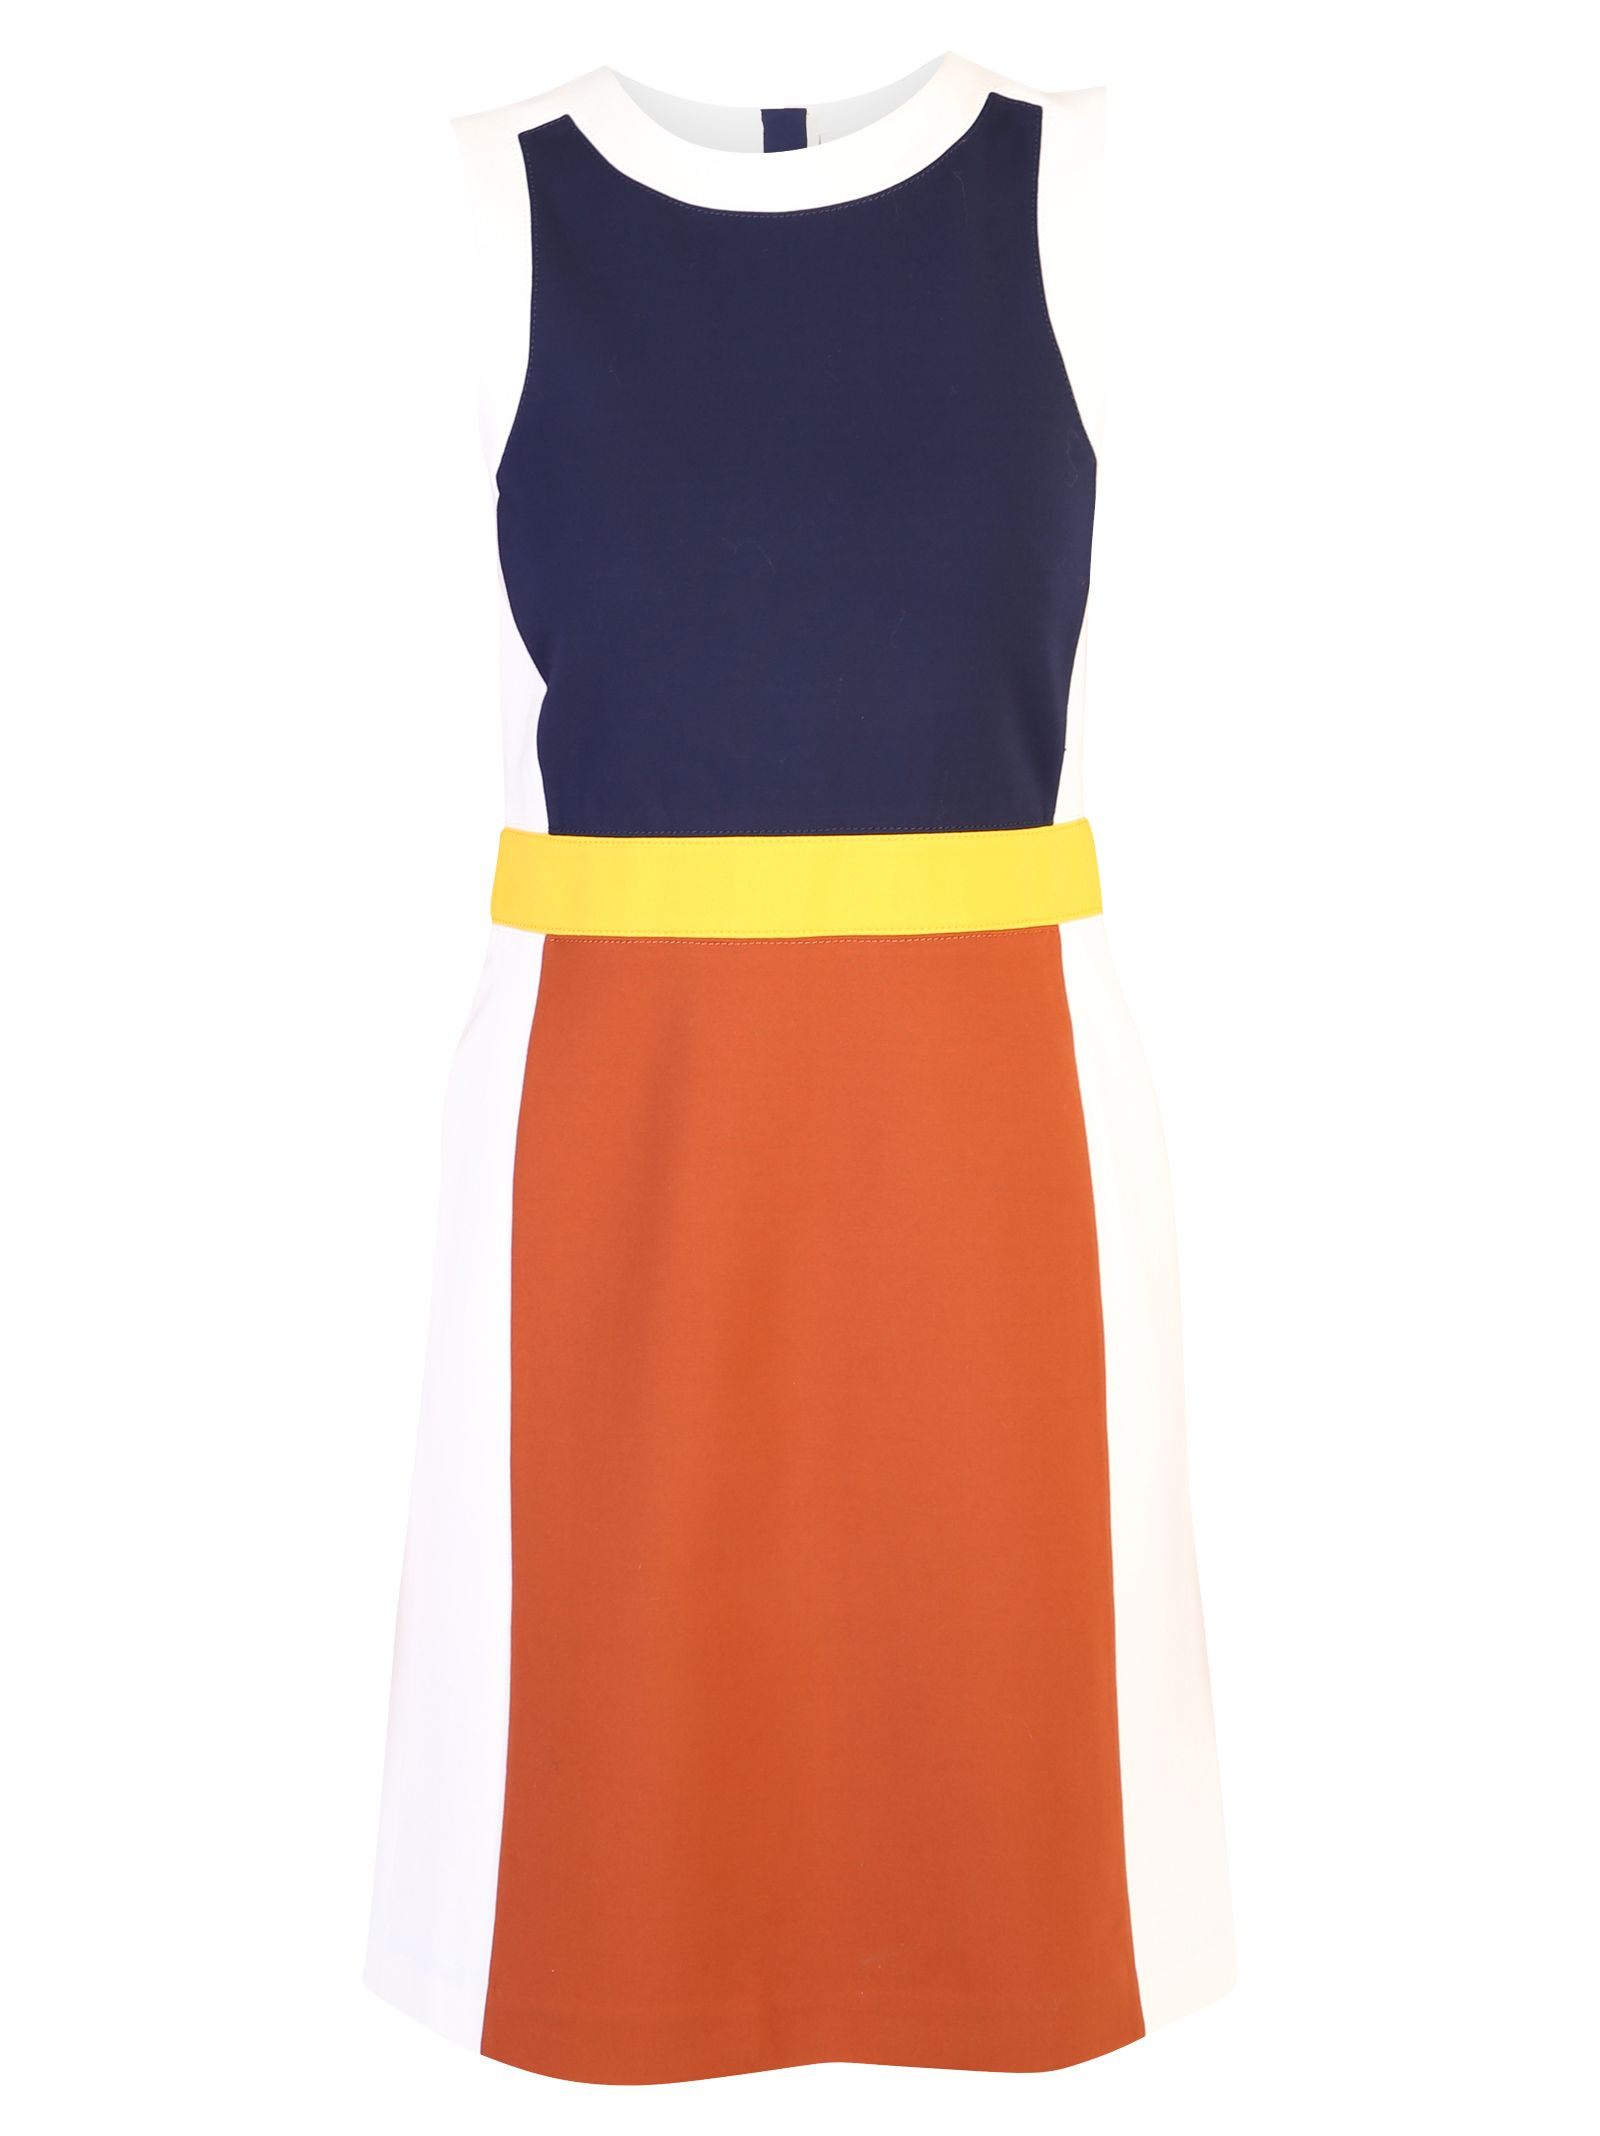 Tory Burch Mya Viscose Blend Dress